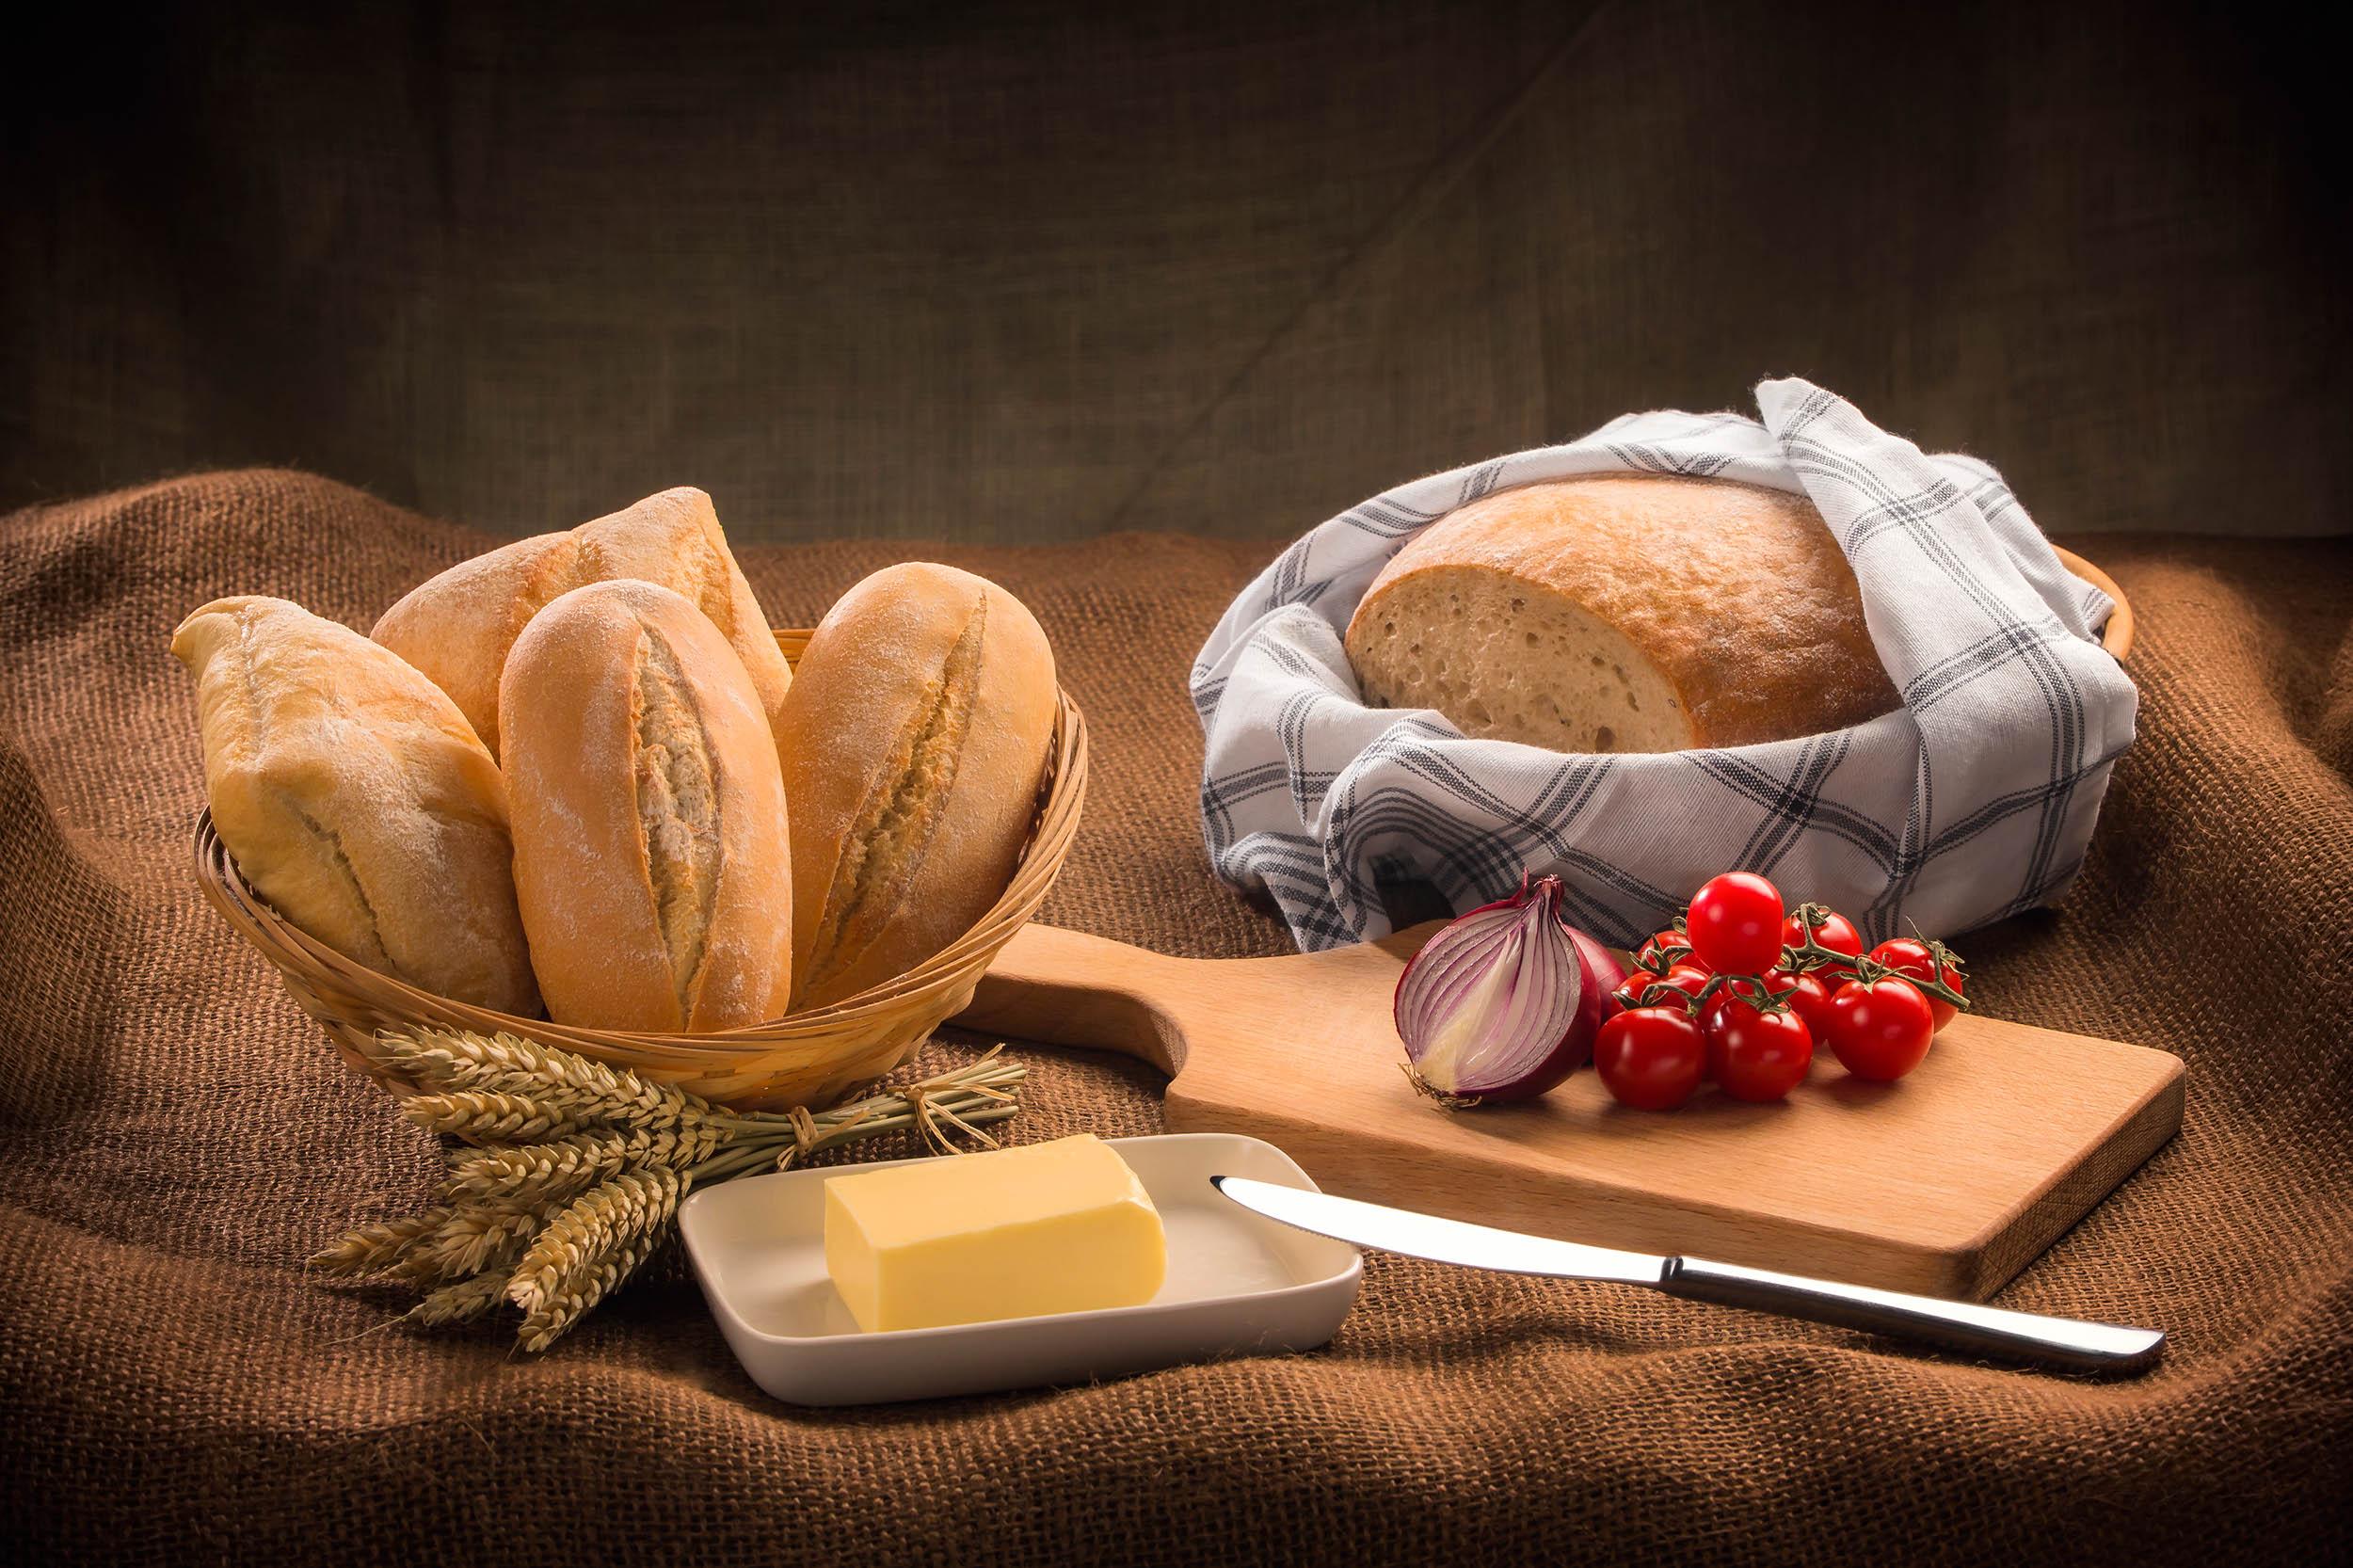 Krumlovský chléb Znojmo